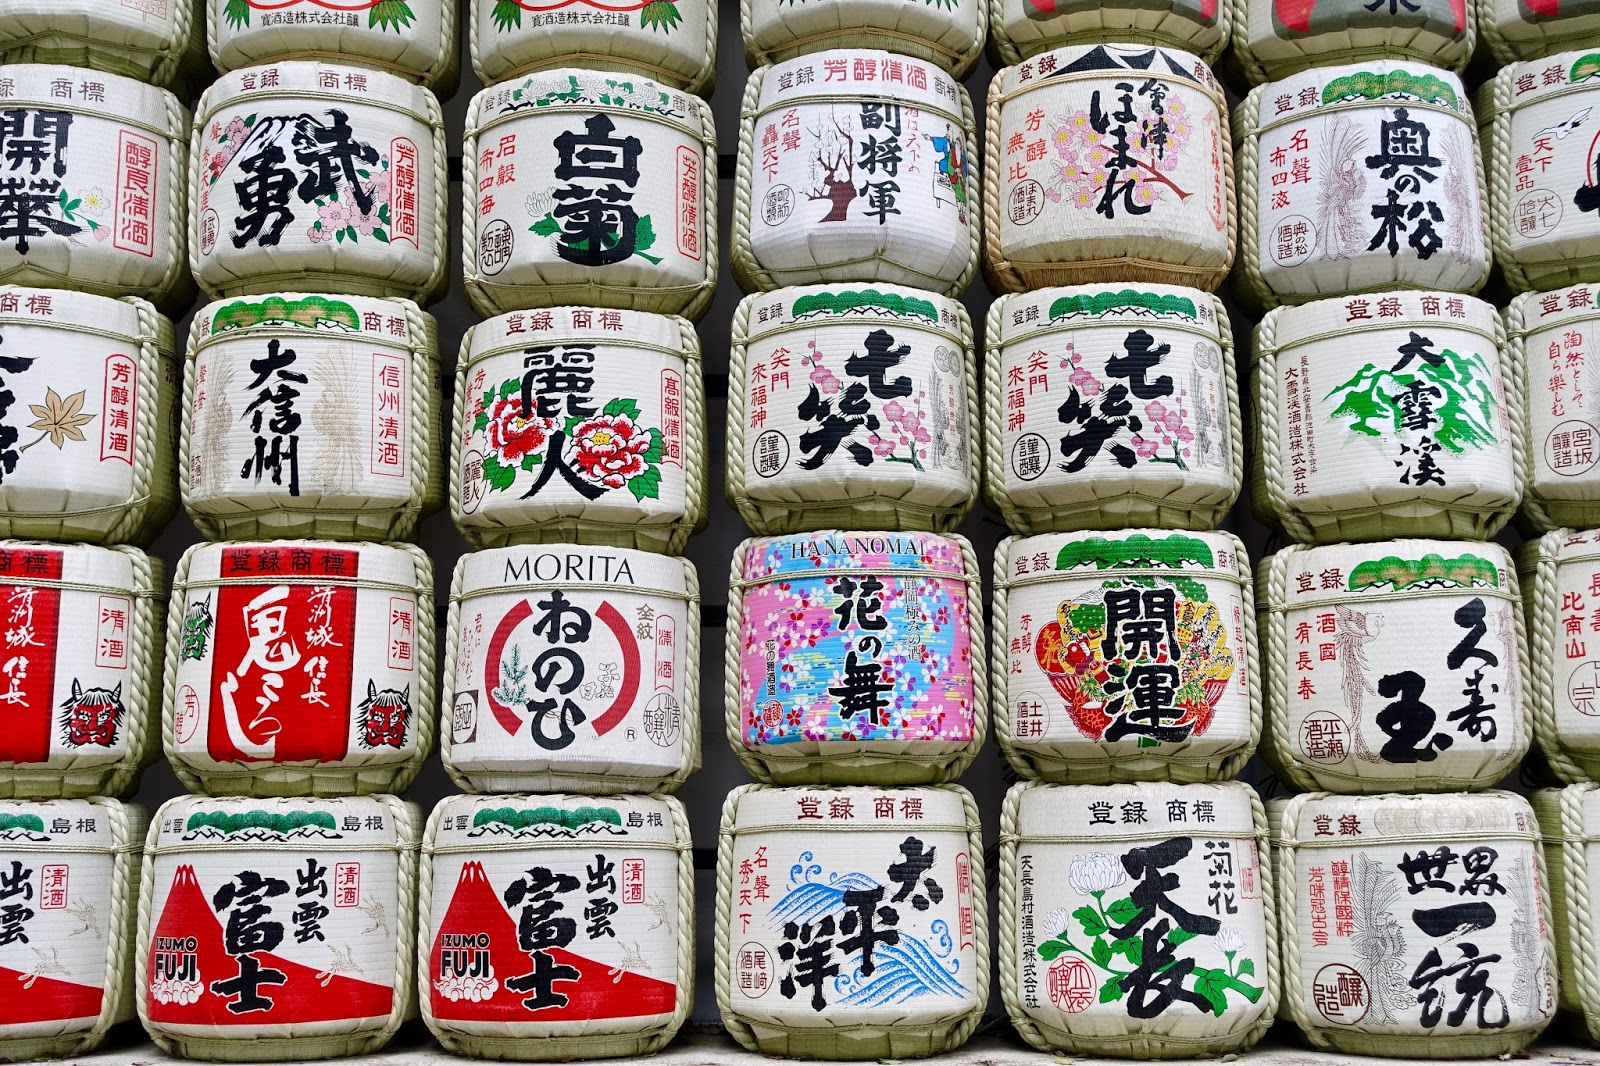 SAKE BARRELS TOKYO JAPAN MEIJI SHRINE